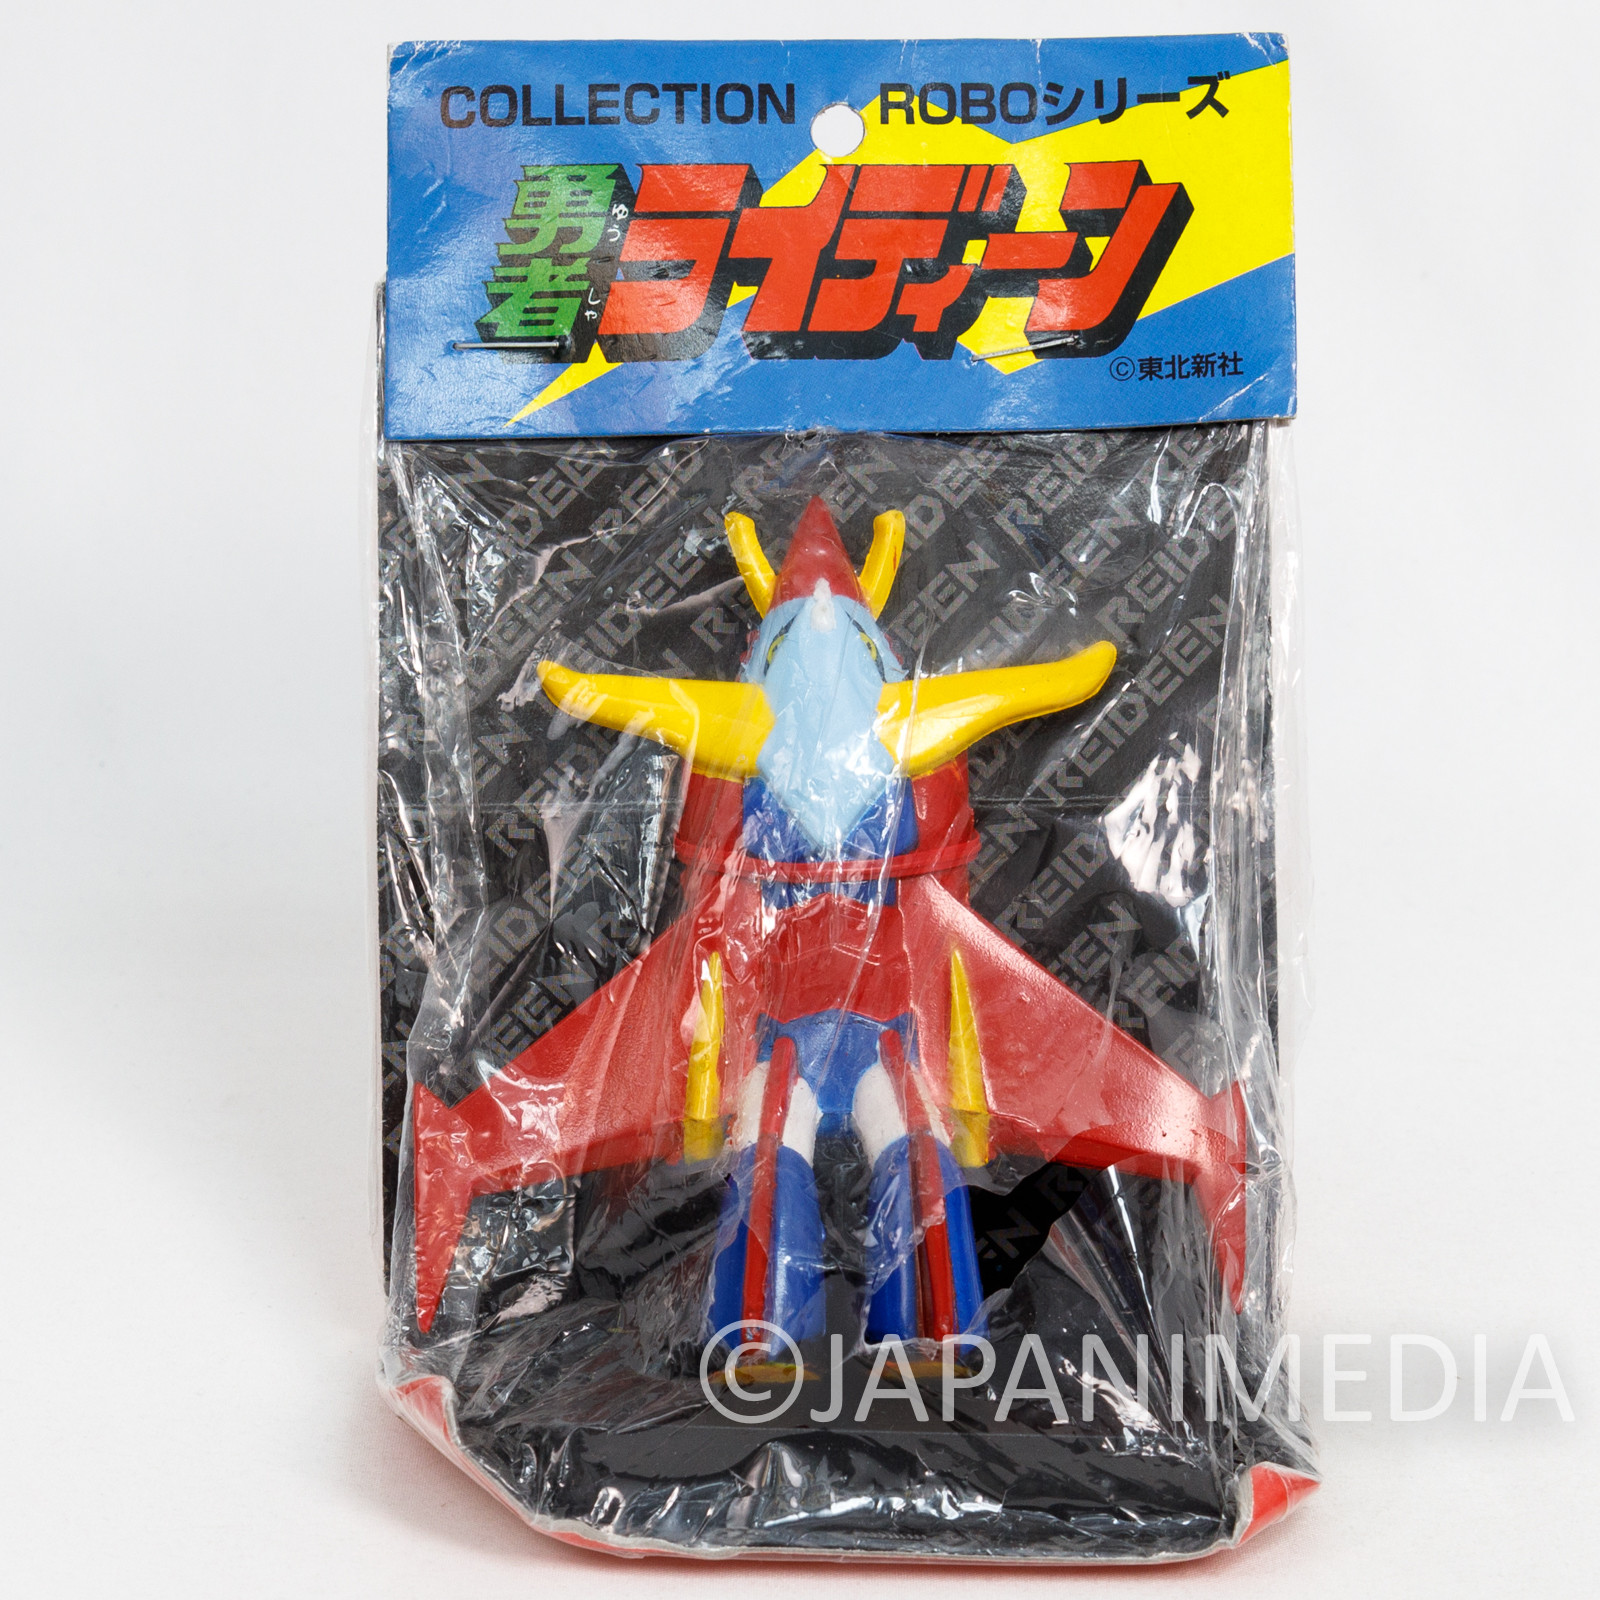 Retro Rydeen the Brave Flight Form Figure Collection Robo JAPAN